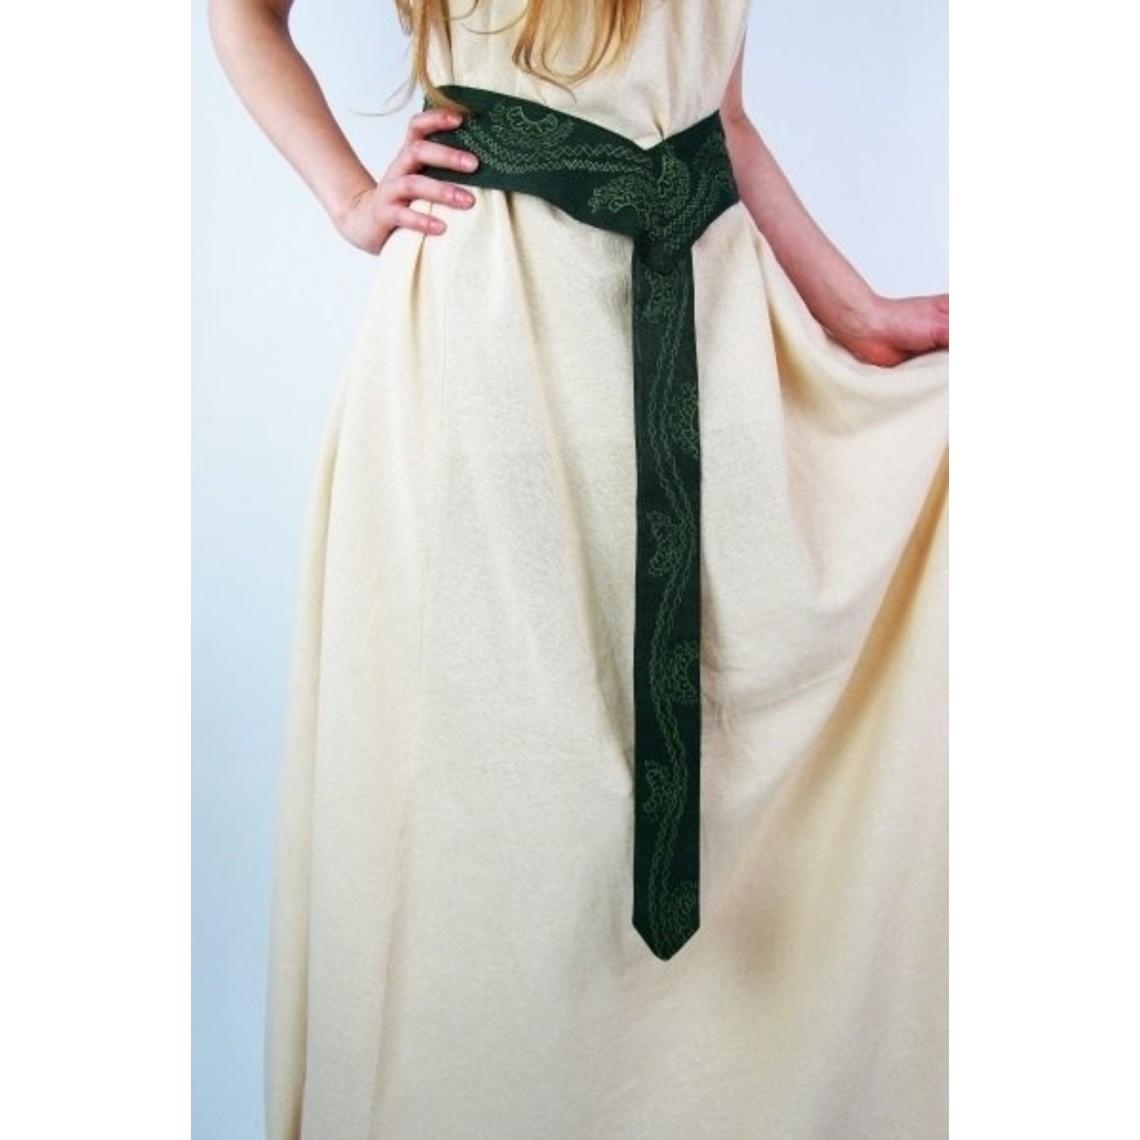 Leonardo Carbone Cintura banda de Tilda, verde